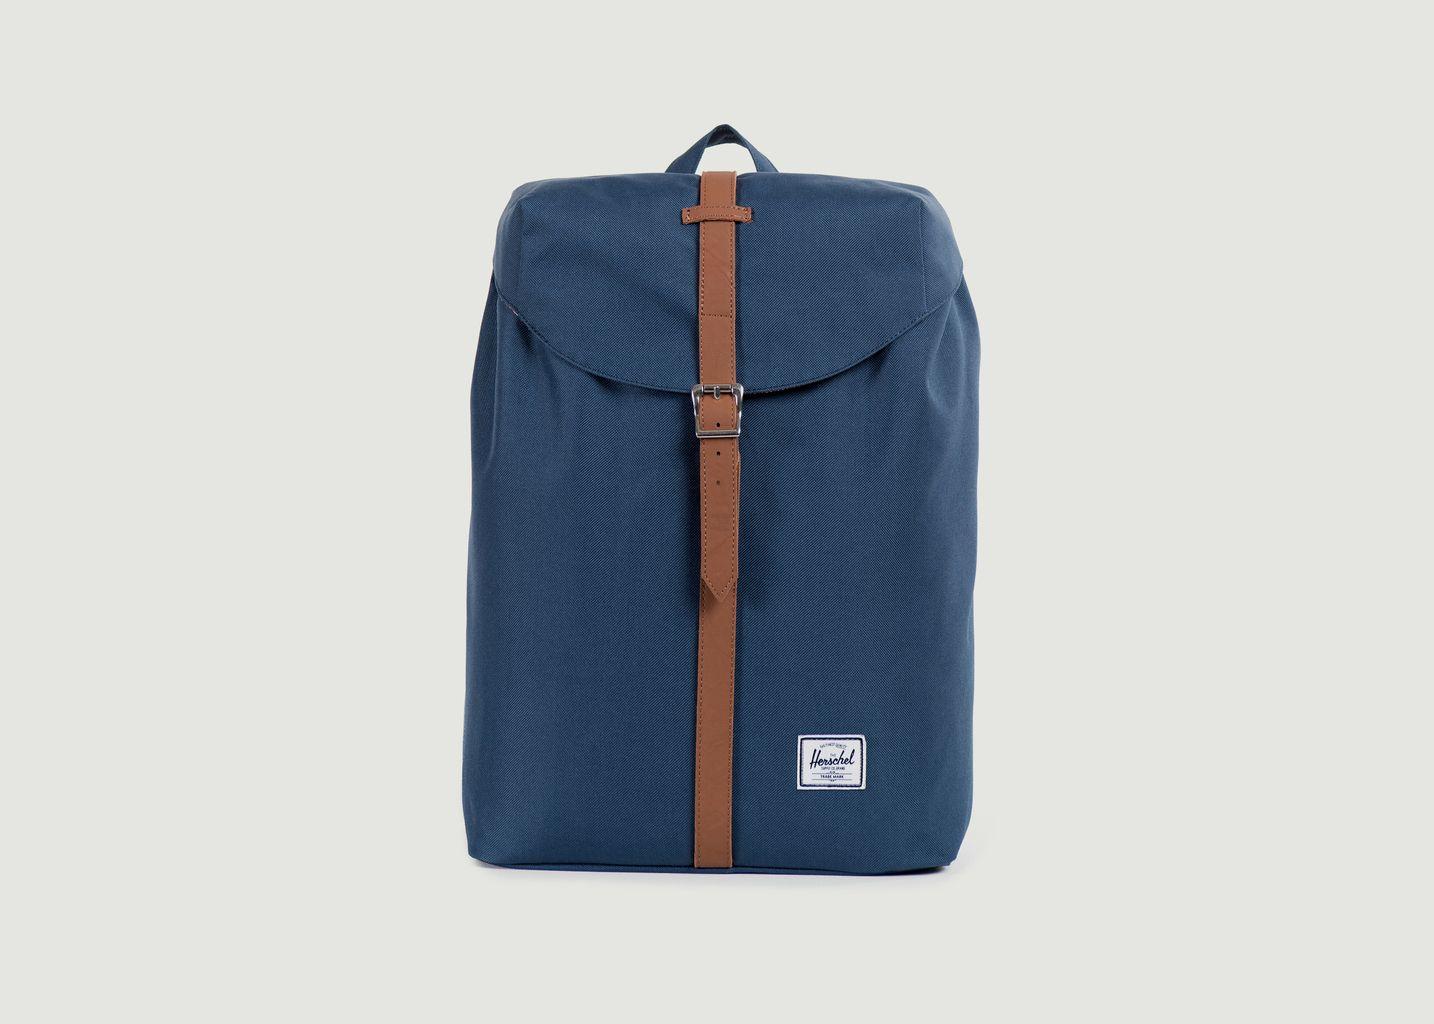 c4a6e465c2e Post Mid Volume Backpack Navy Blue Herschel Supply Studio